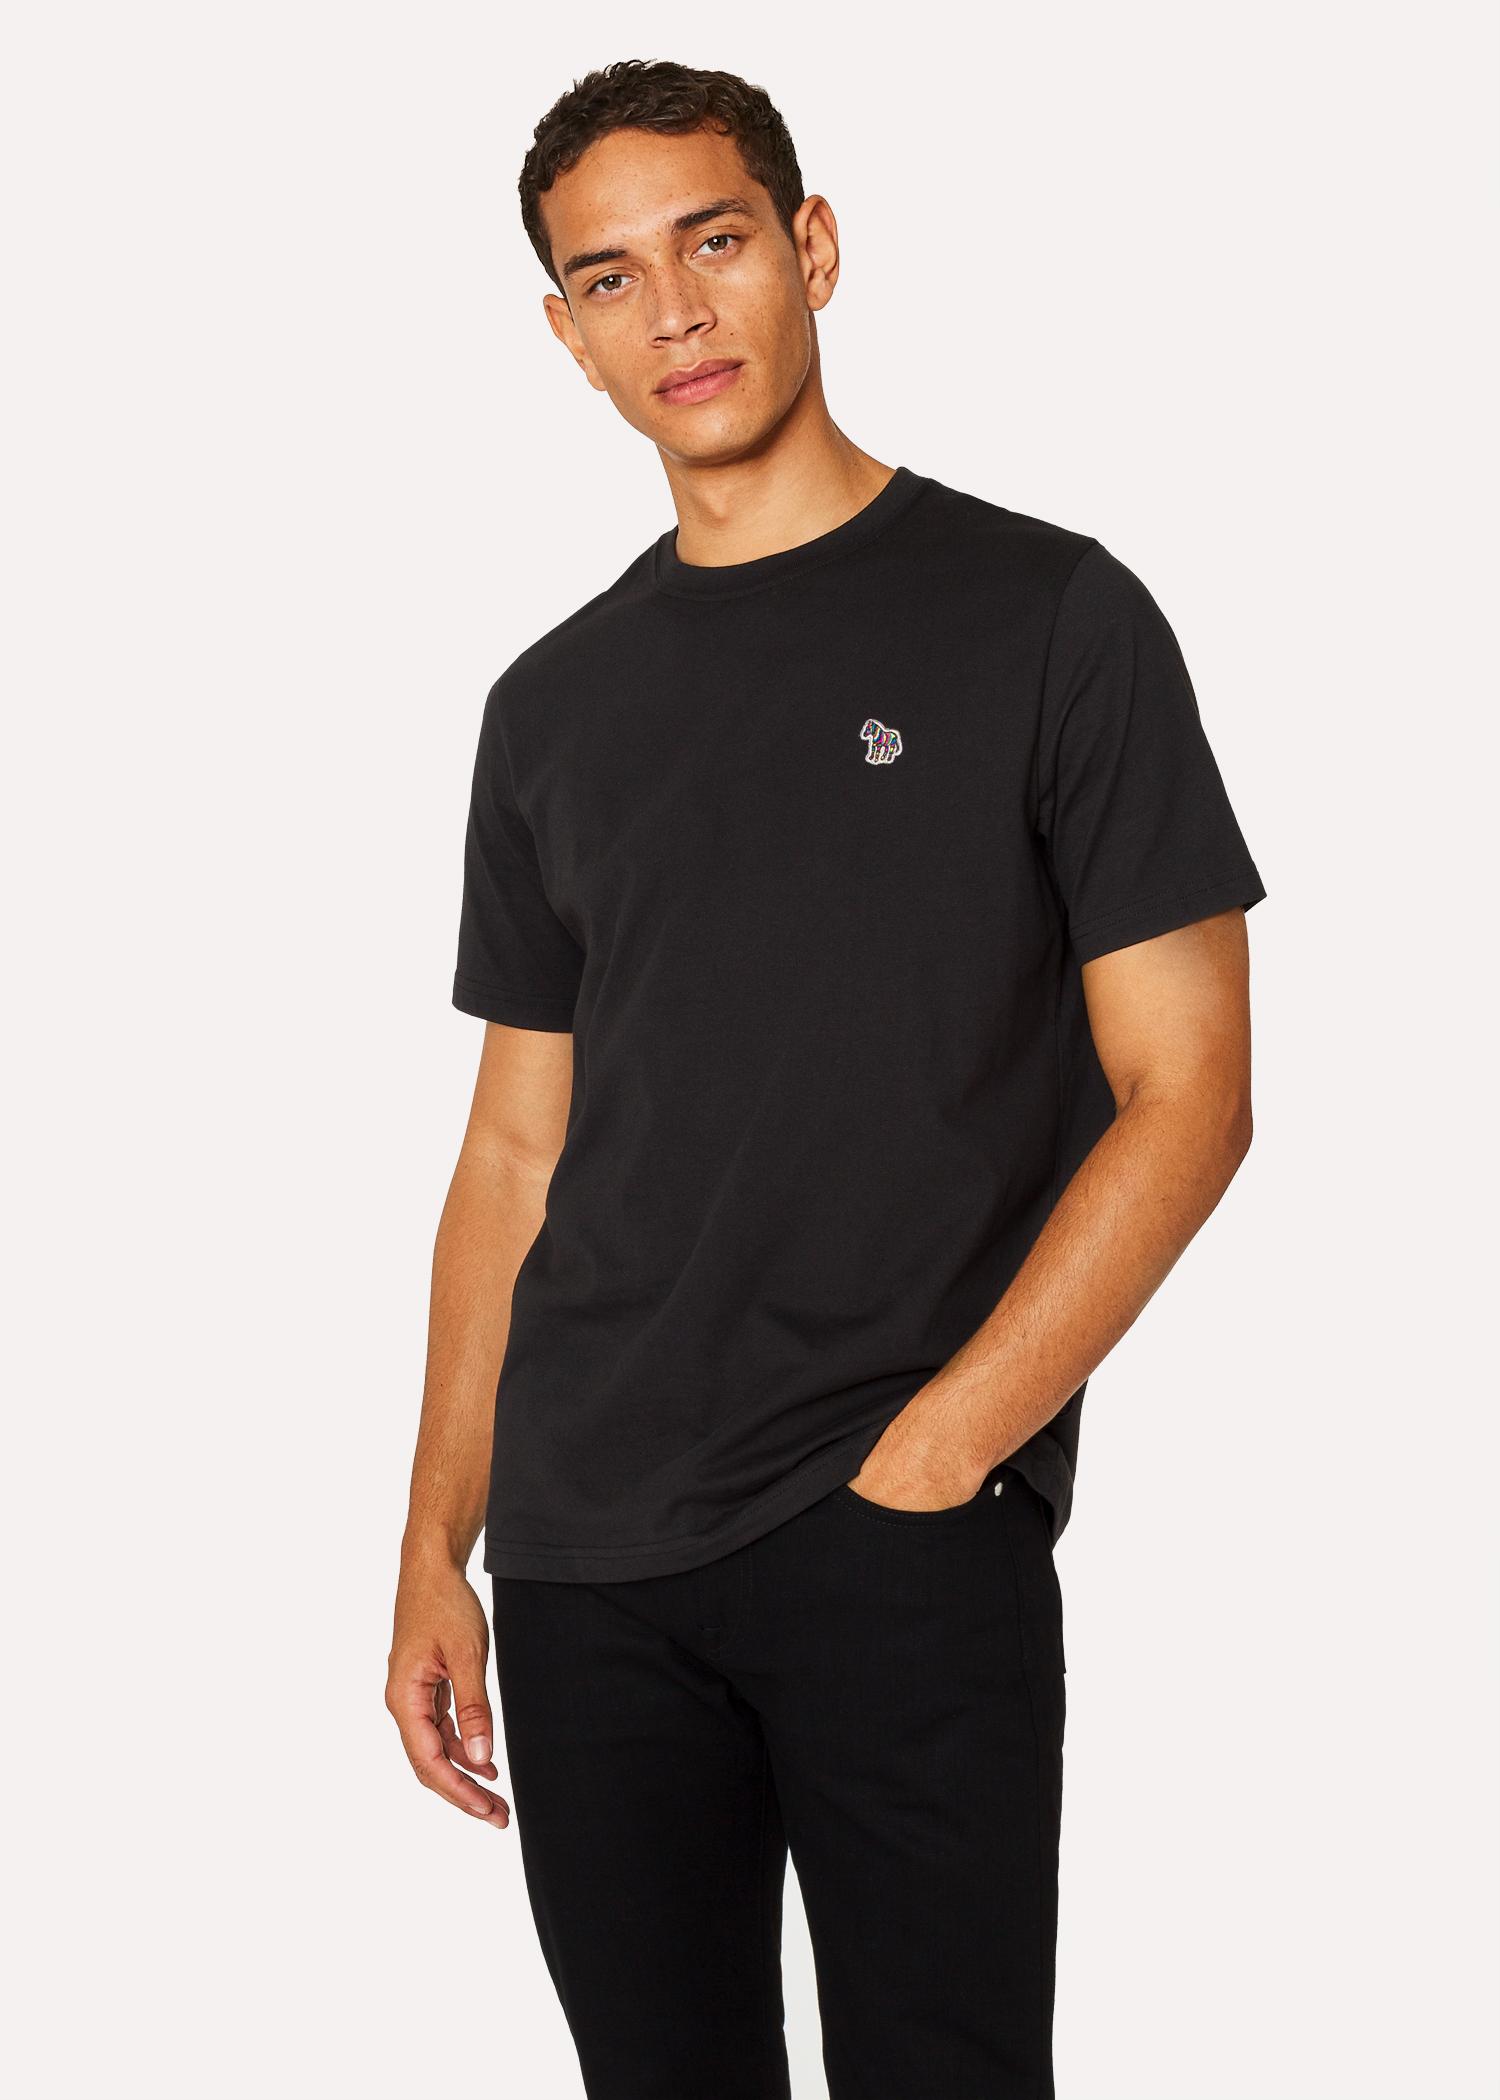 5304d1527980 Men's Black Organic-Cotton Zebra Logo T-Shirt by Paul Smith